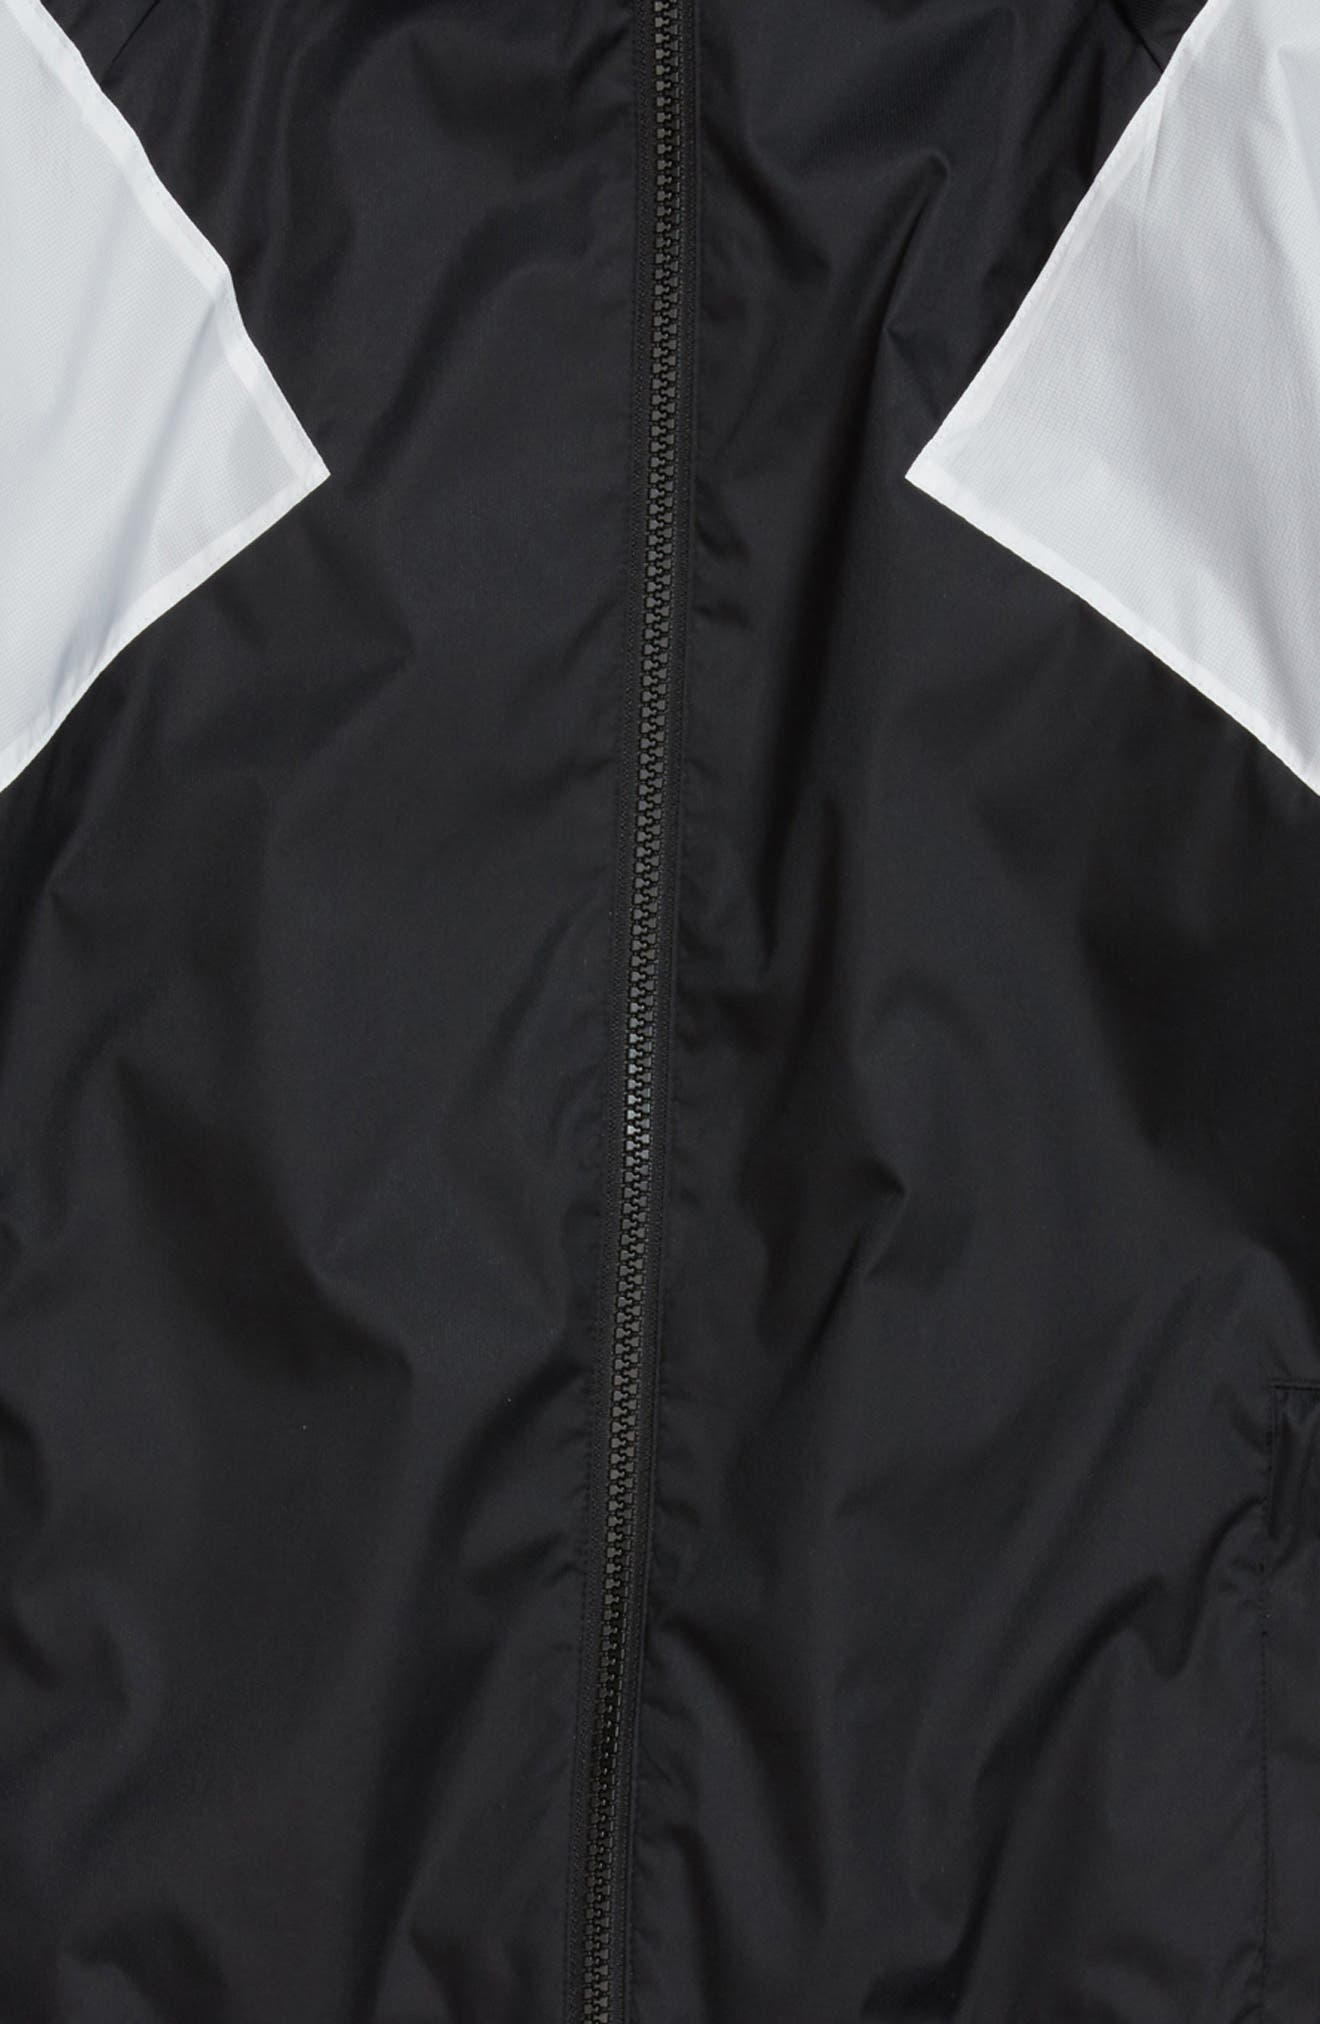 EQT Hooded Windbreaker Jacket,                             Alternate thumbnail 2, color,                             001